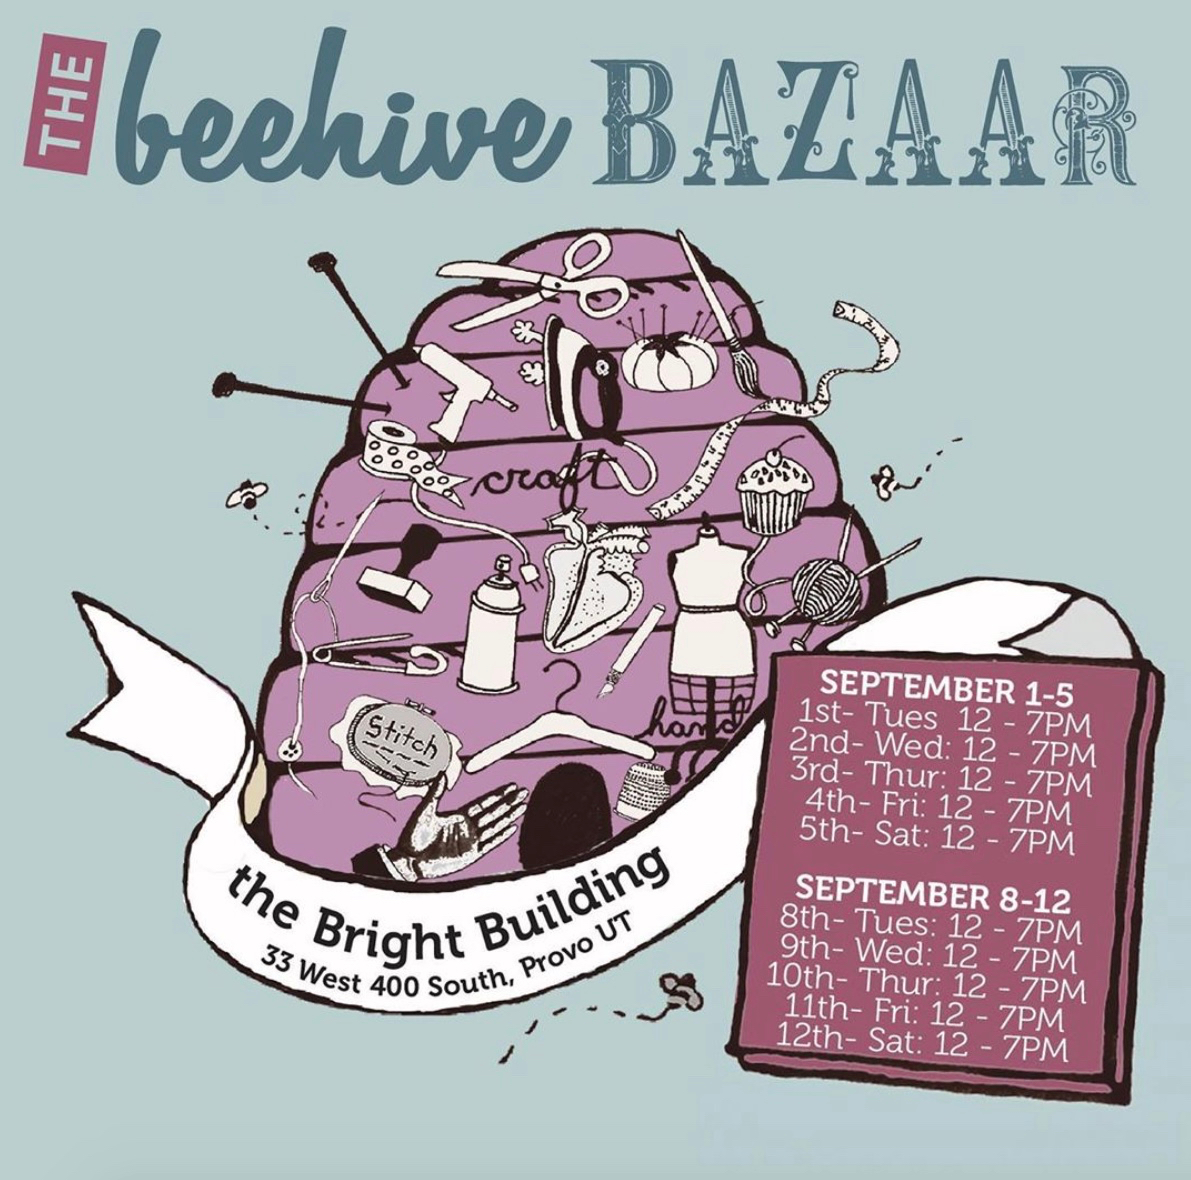 Fall 2020 Beehive Bazaar Handmade Art And Craft Fair Slug Magazine